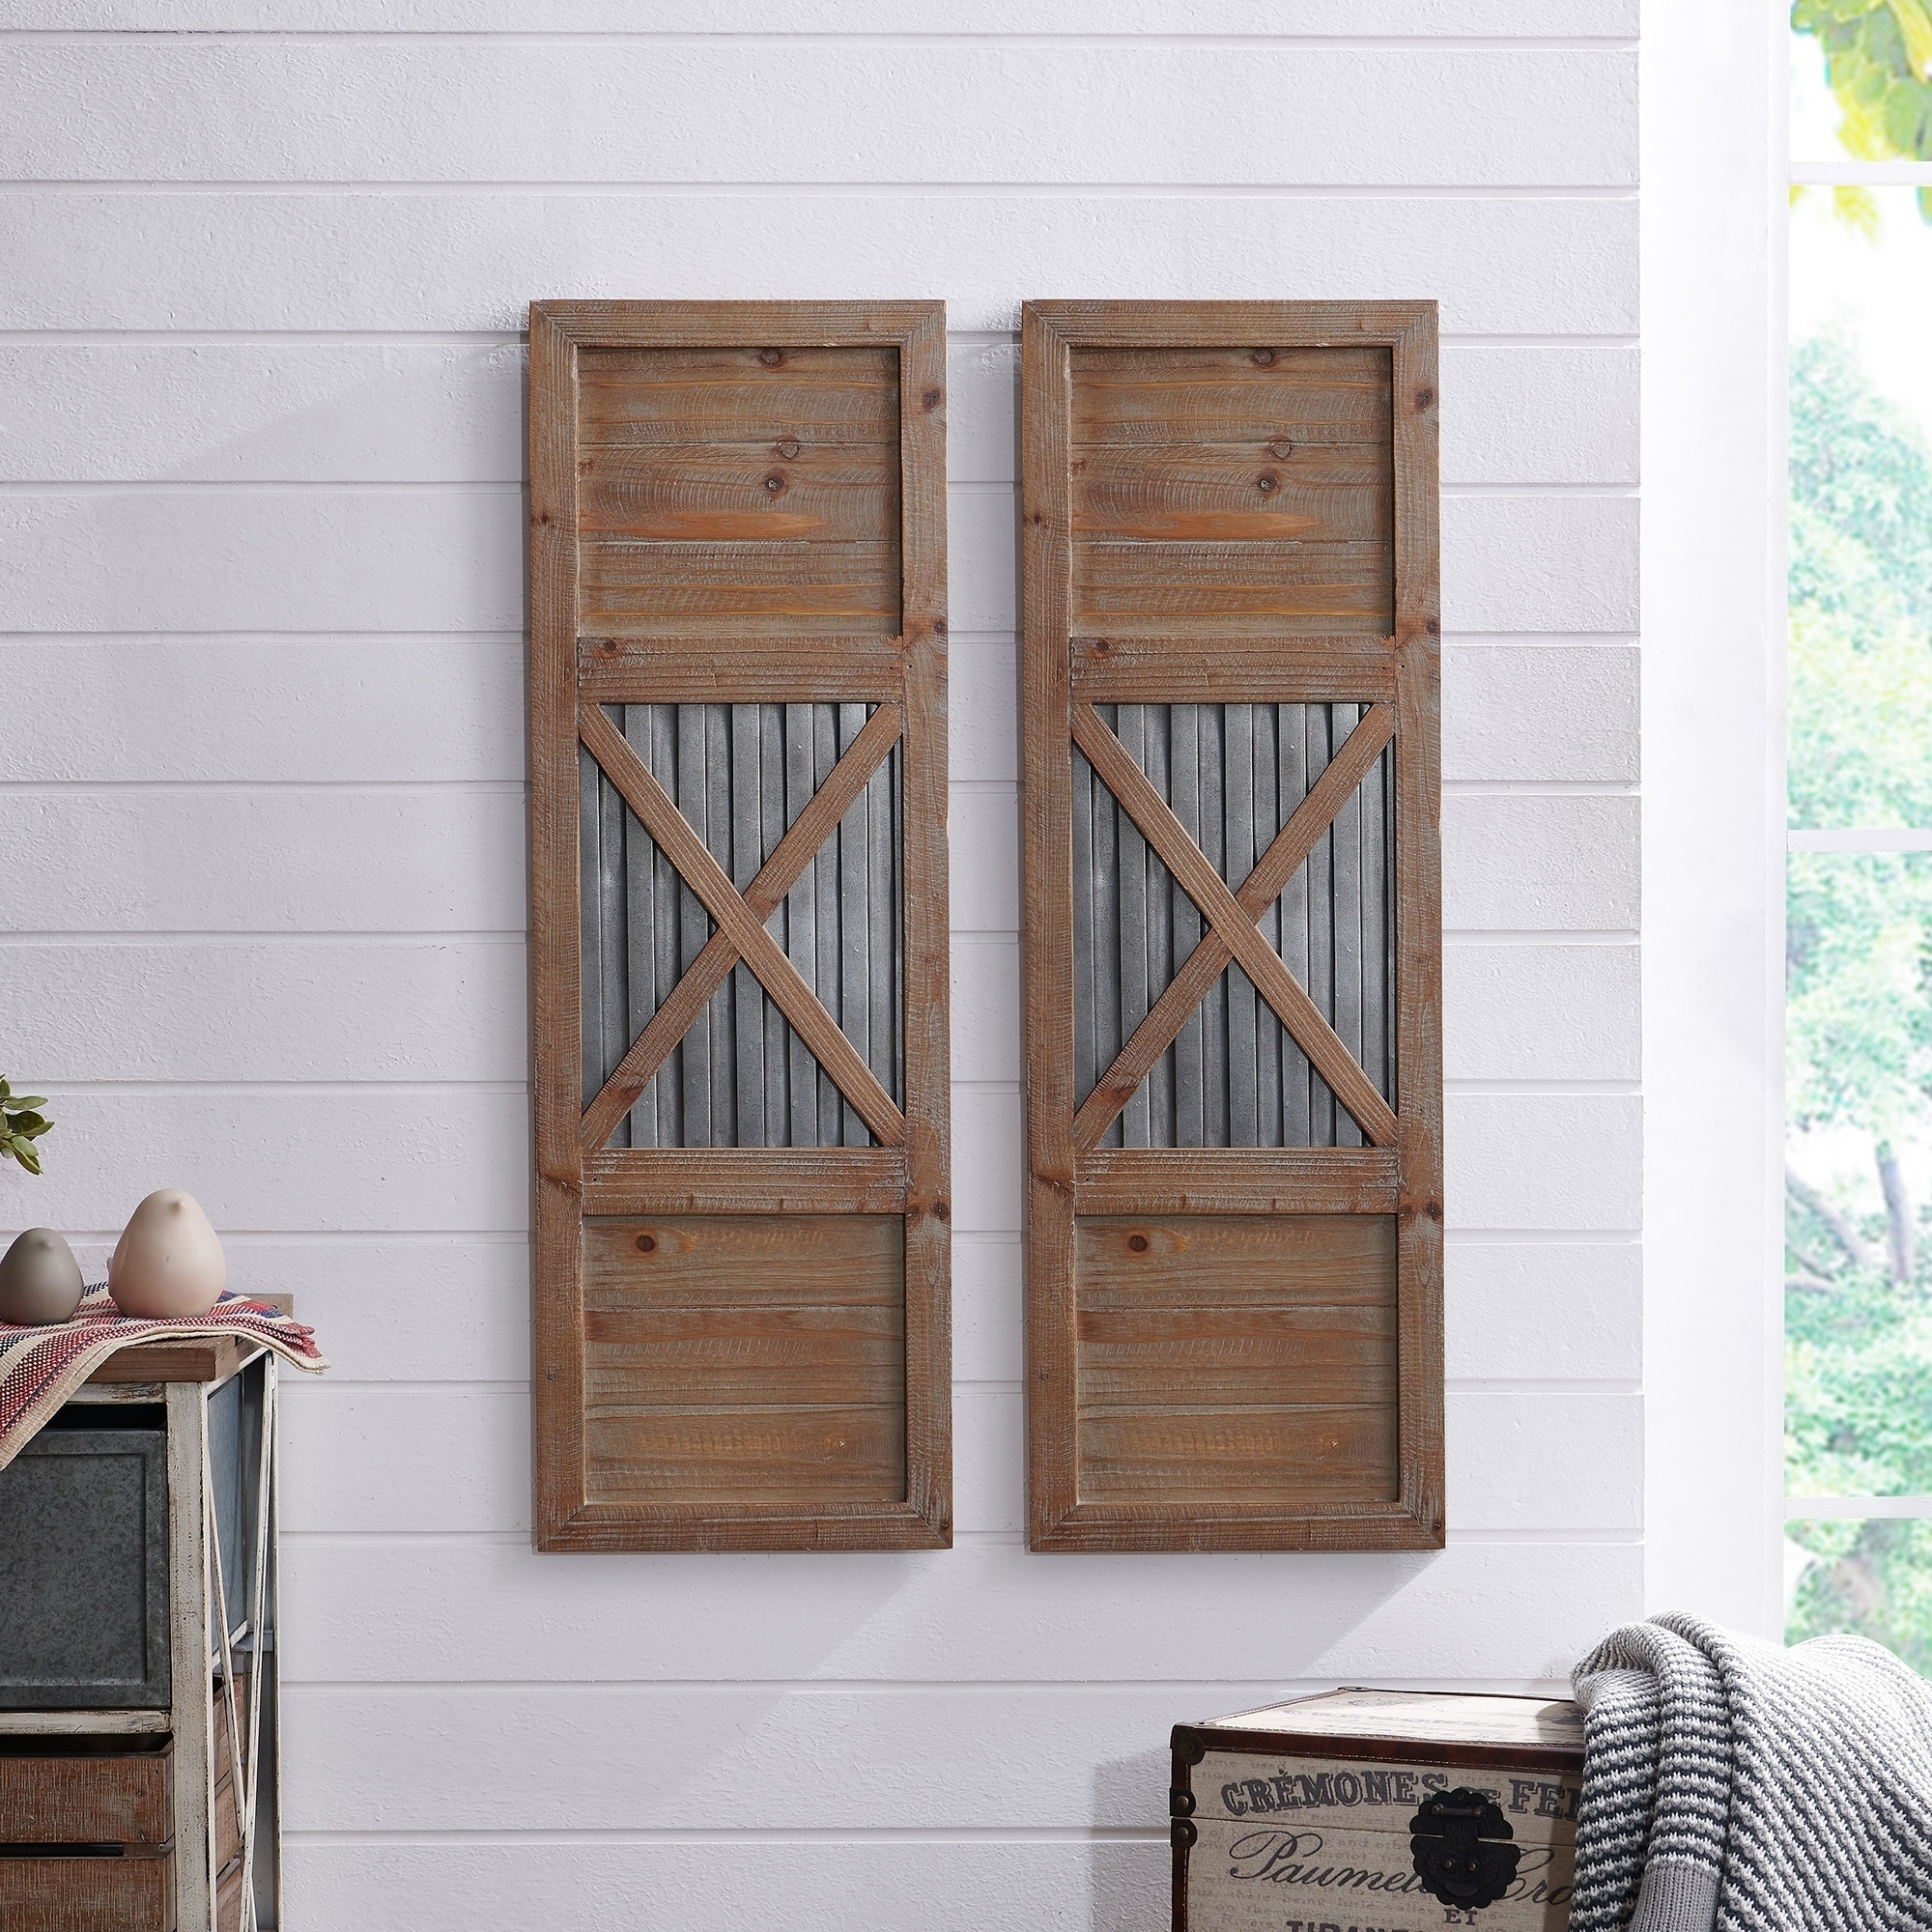 Online Shopping Bedding Furniture Electronics Jewelry Clothing More In 2020 Shutter Wall Shutter Wall Decor Rustic Shutters